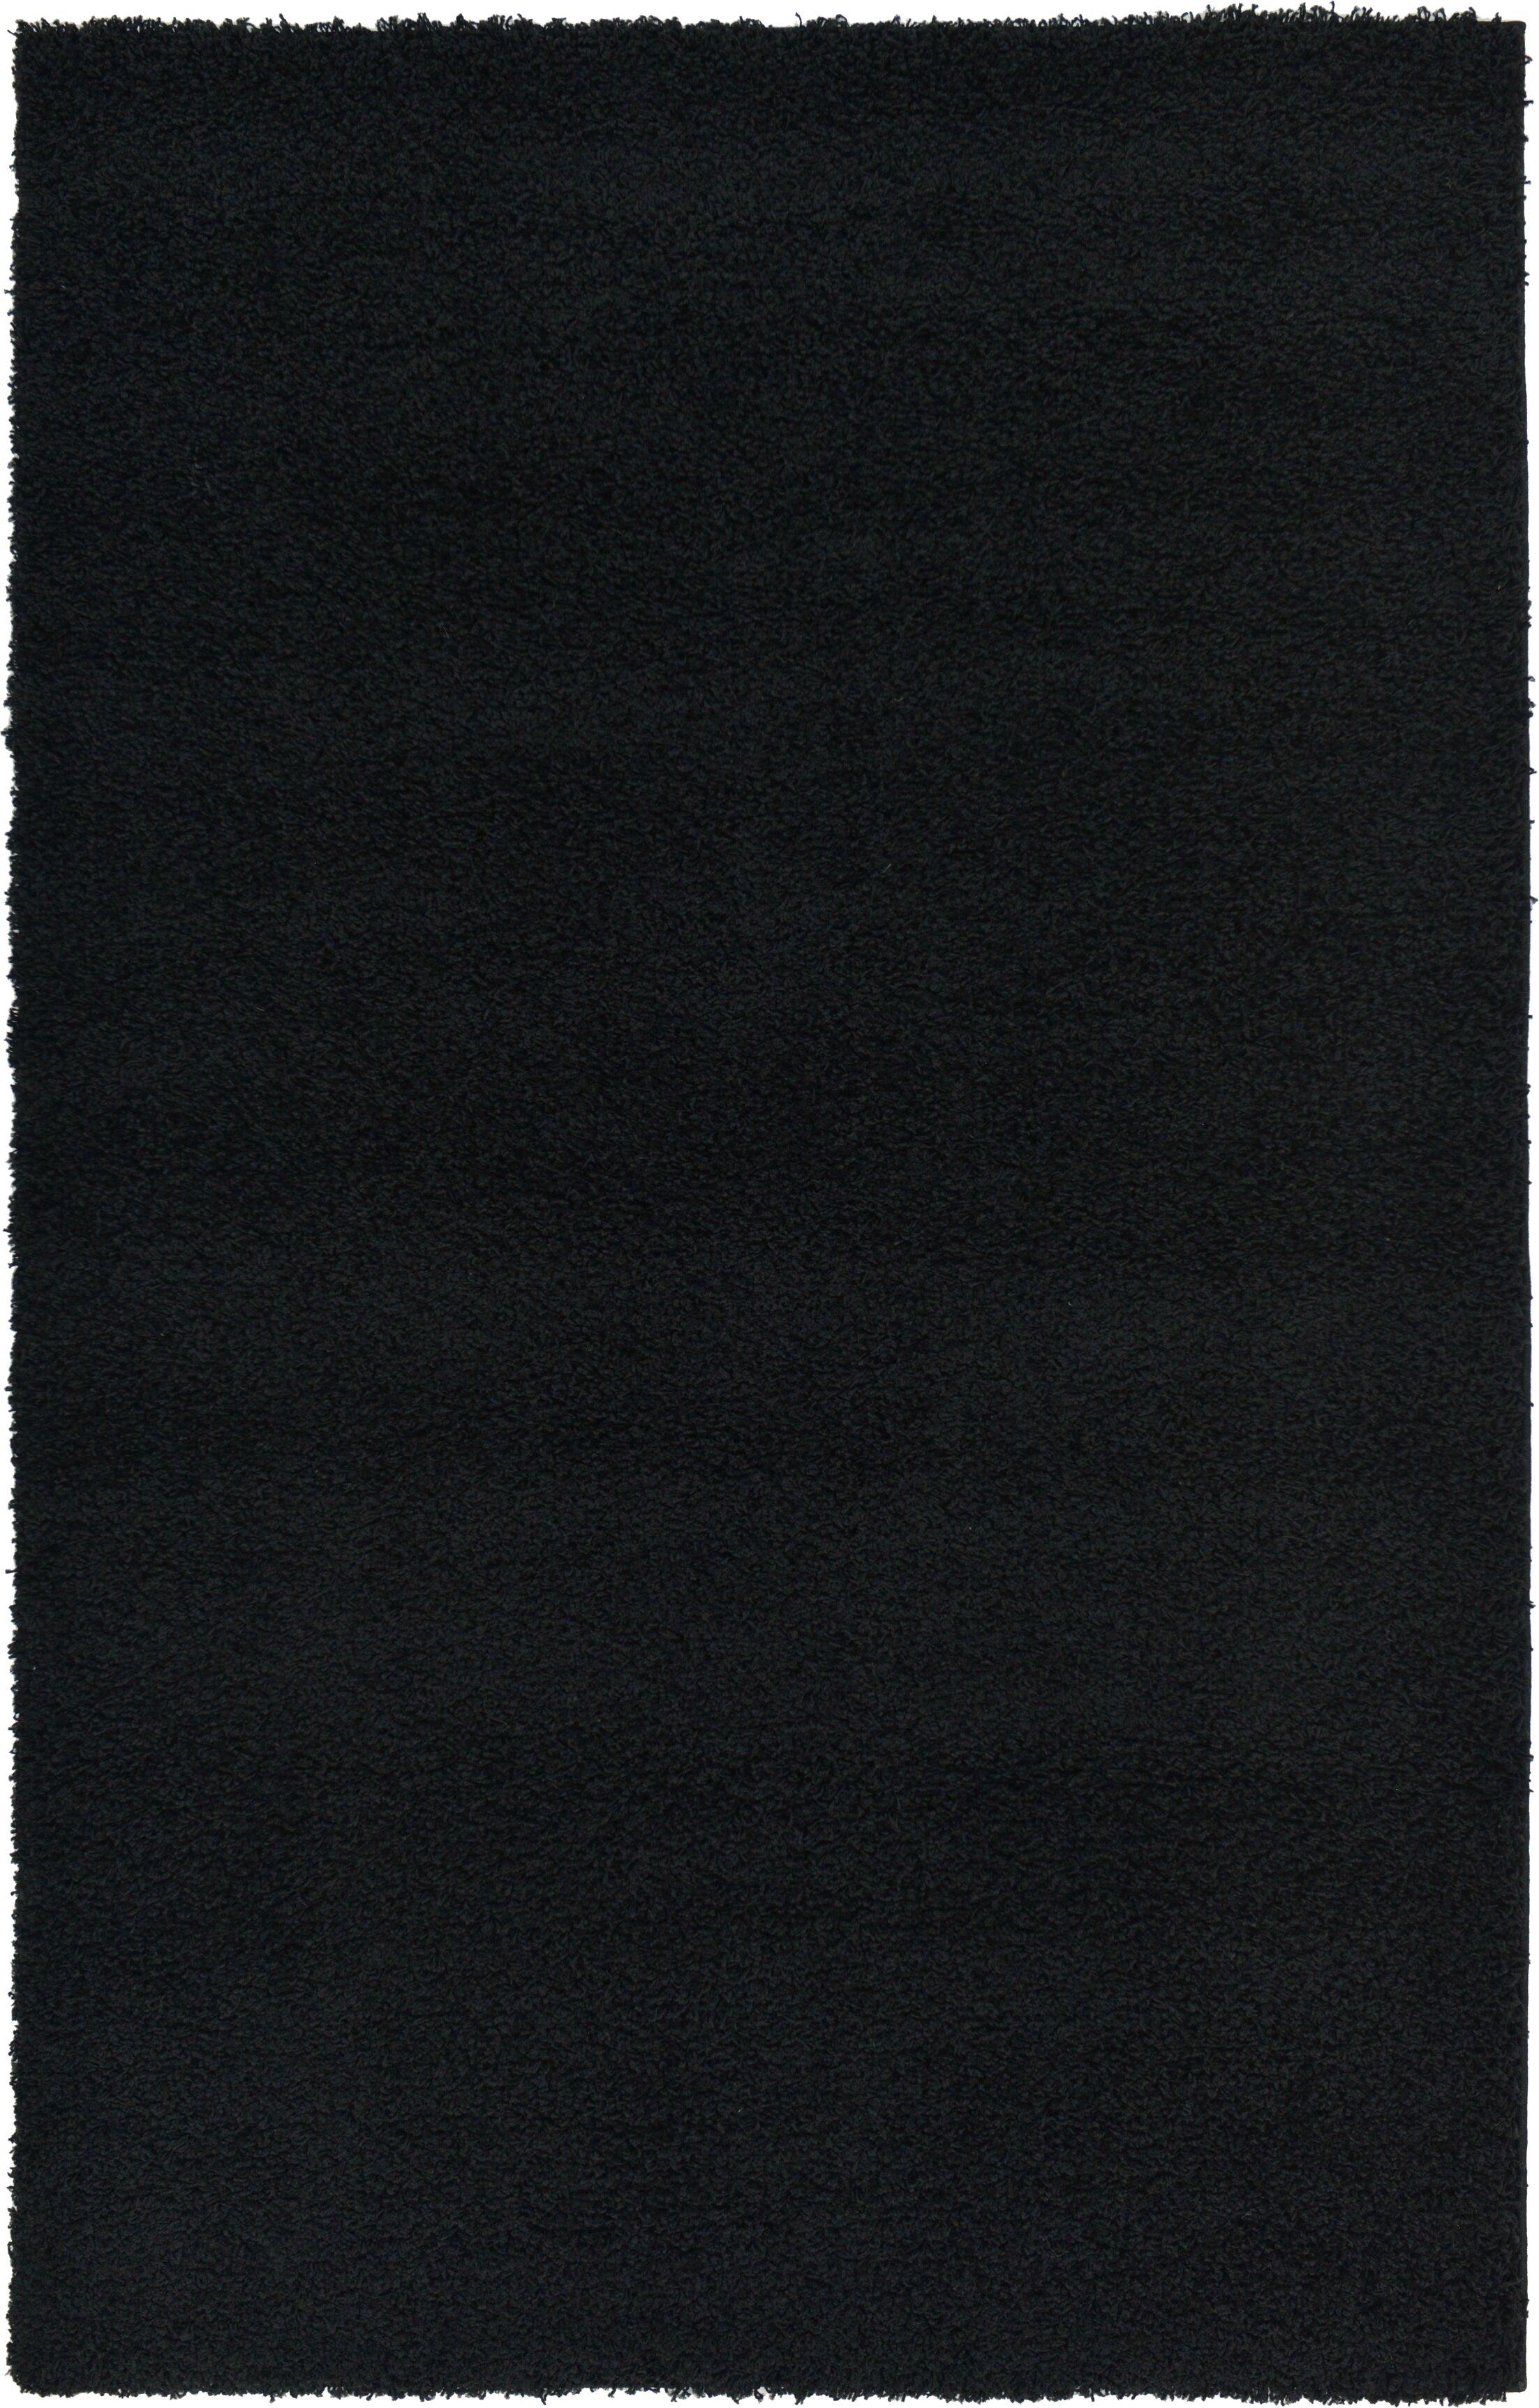 Lilah Black Area Rug Rug Size: Rectangle 5' x 8'